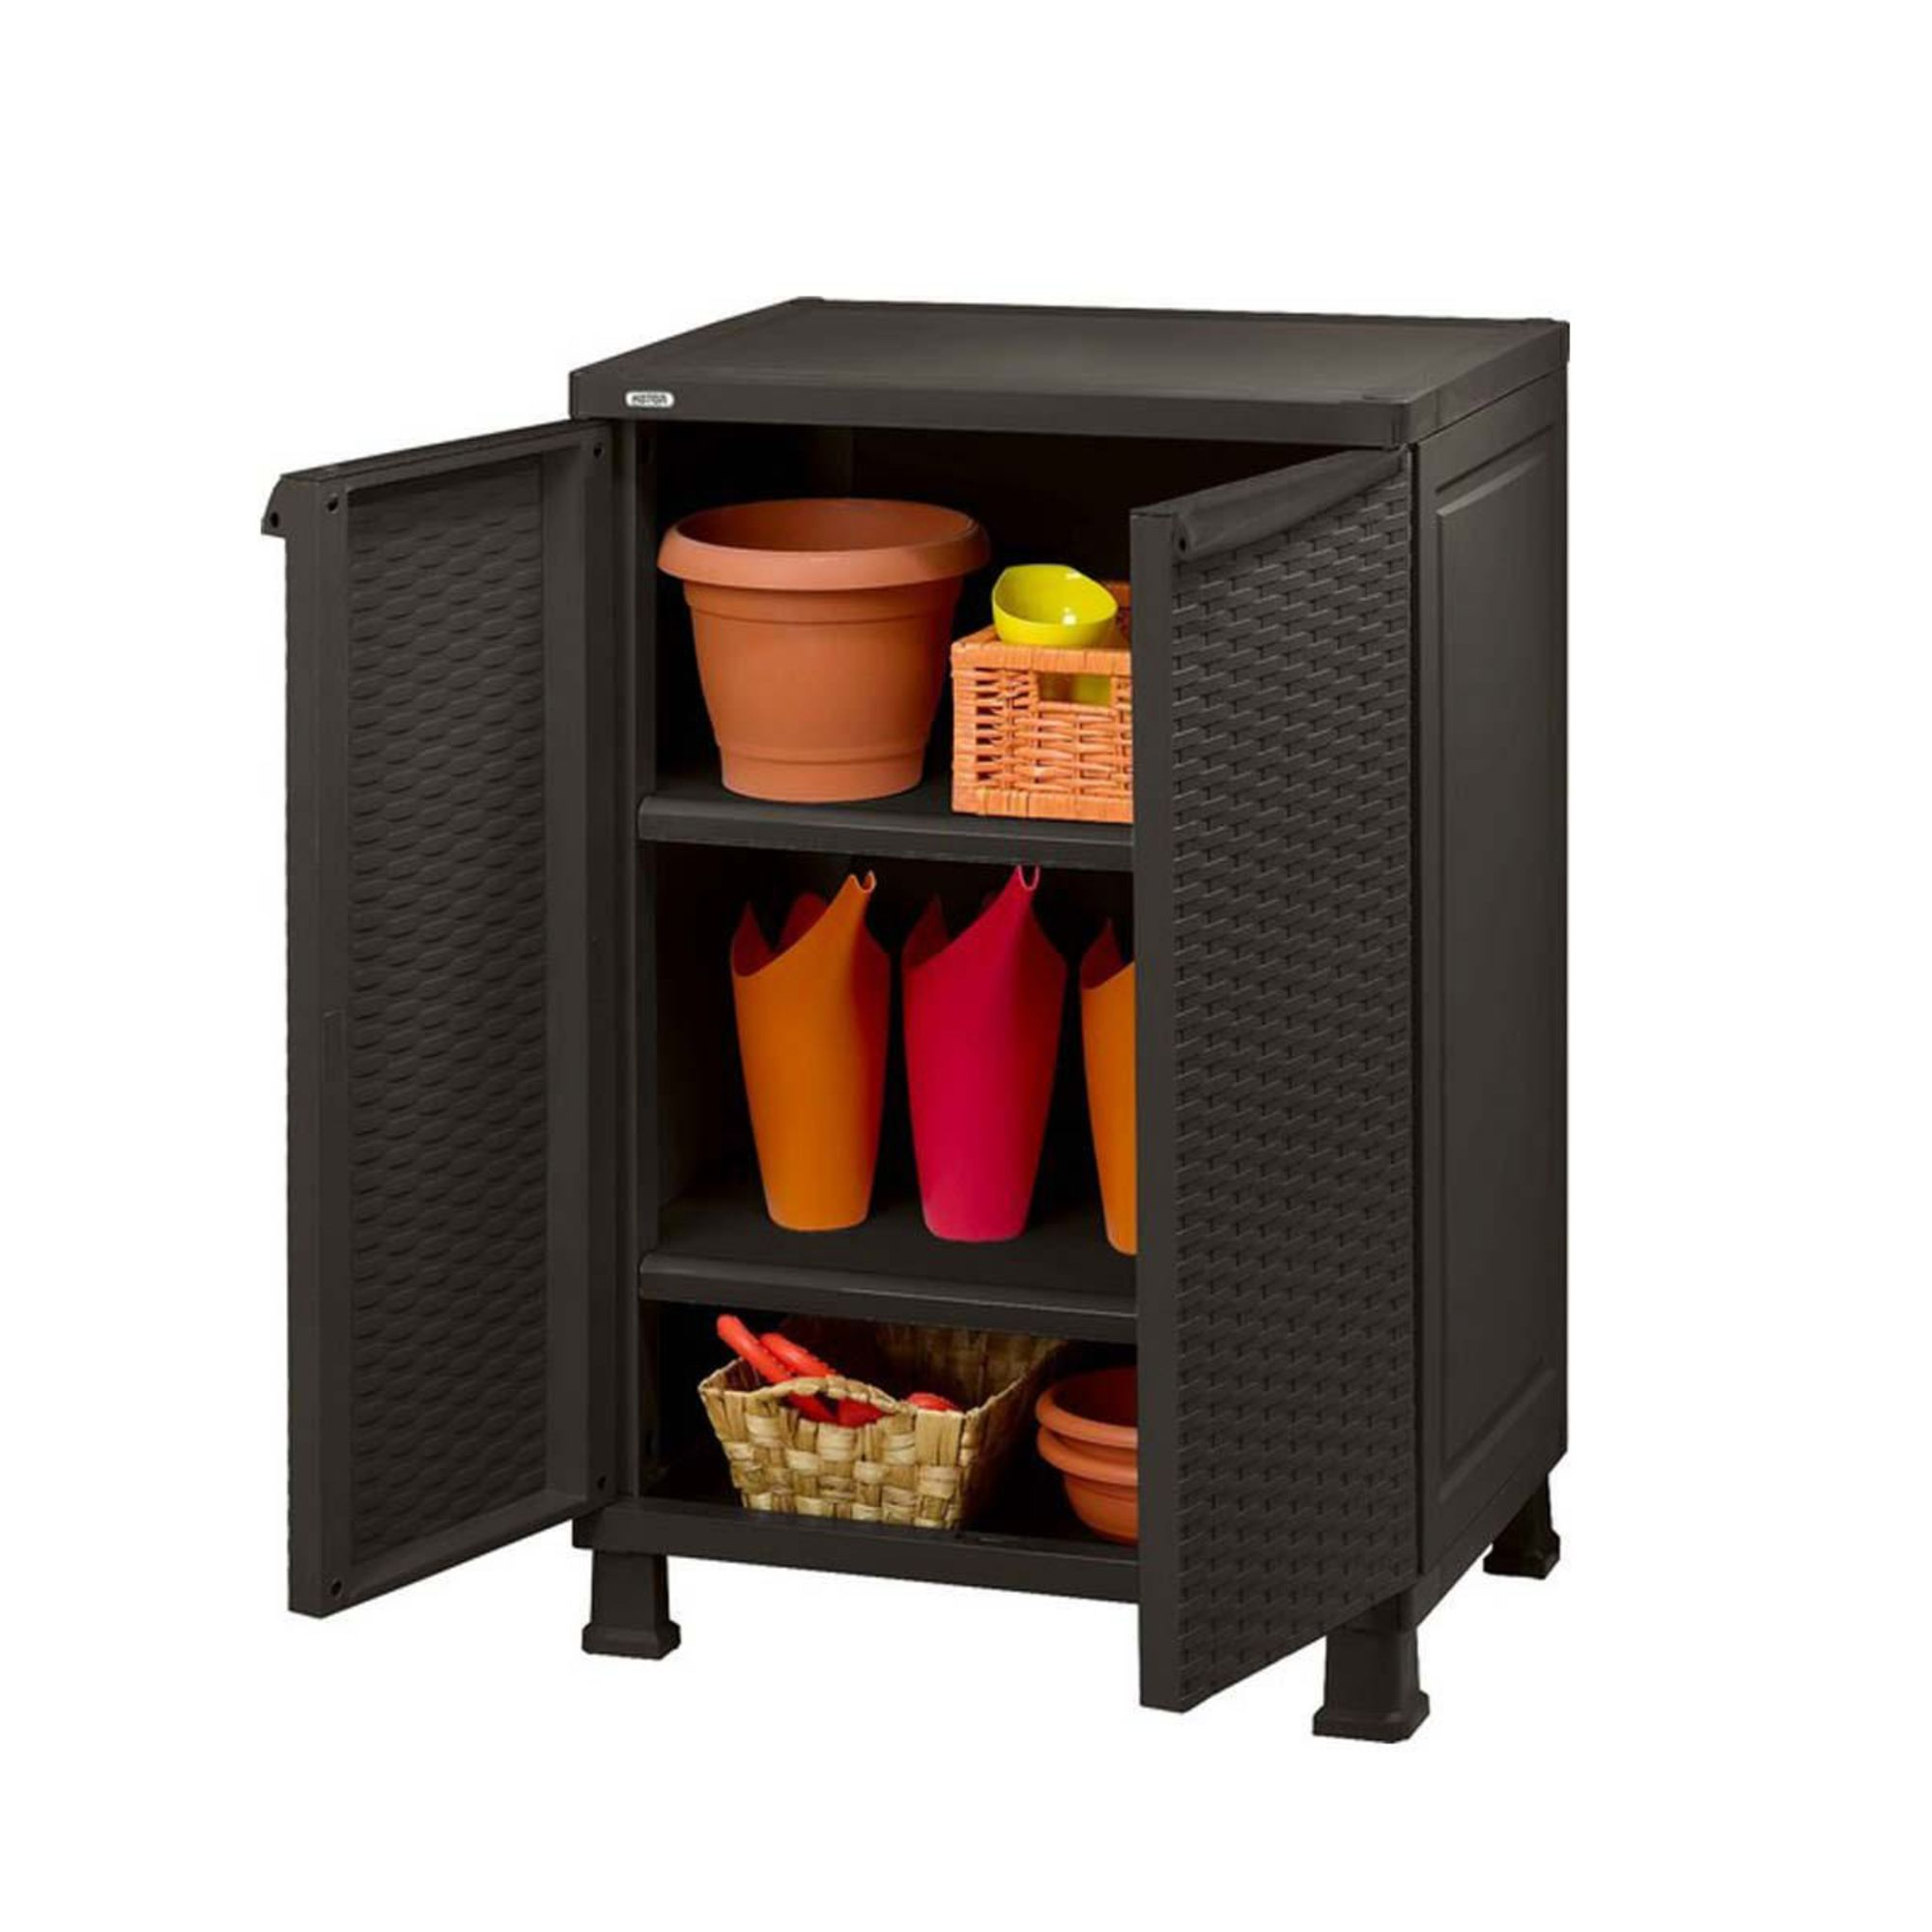 schrank f r garten sf35 hitoiro. Black Bedroom Furniture Sets. Home Design Ideas